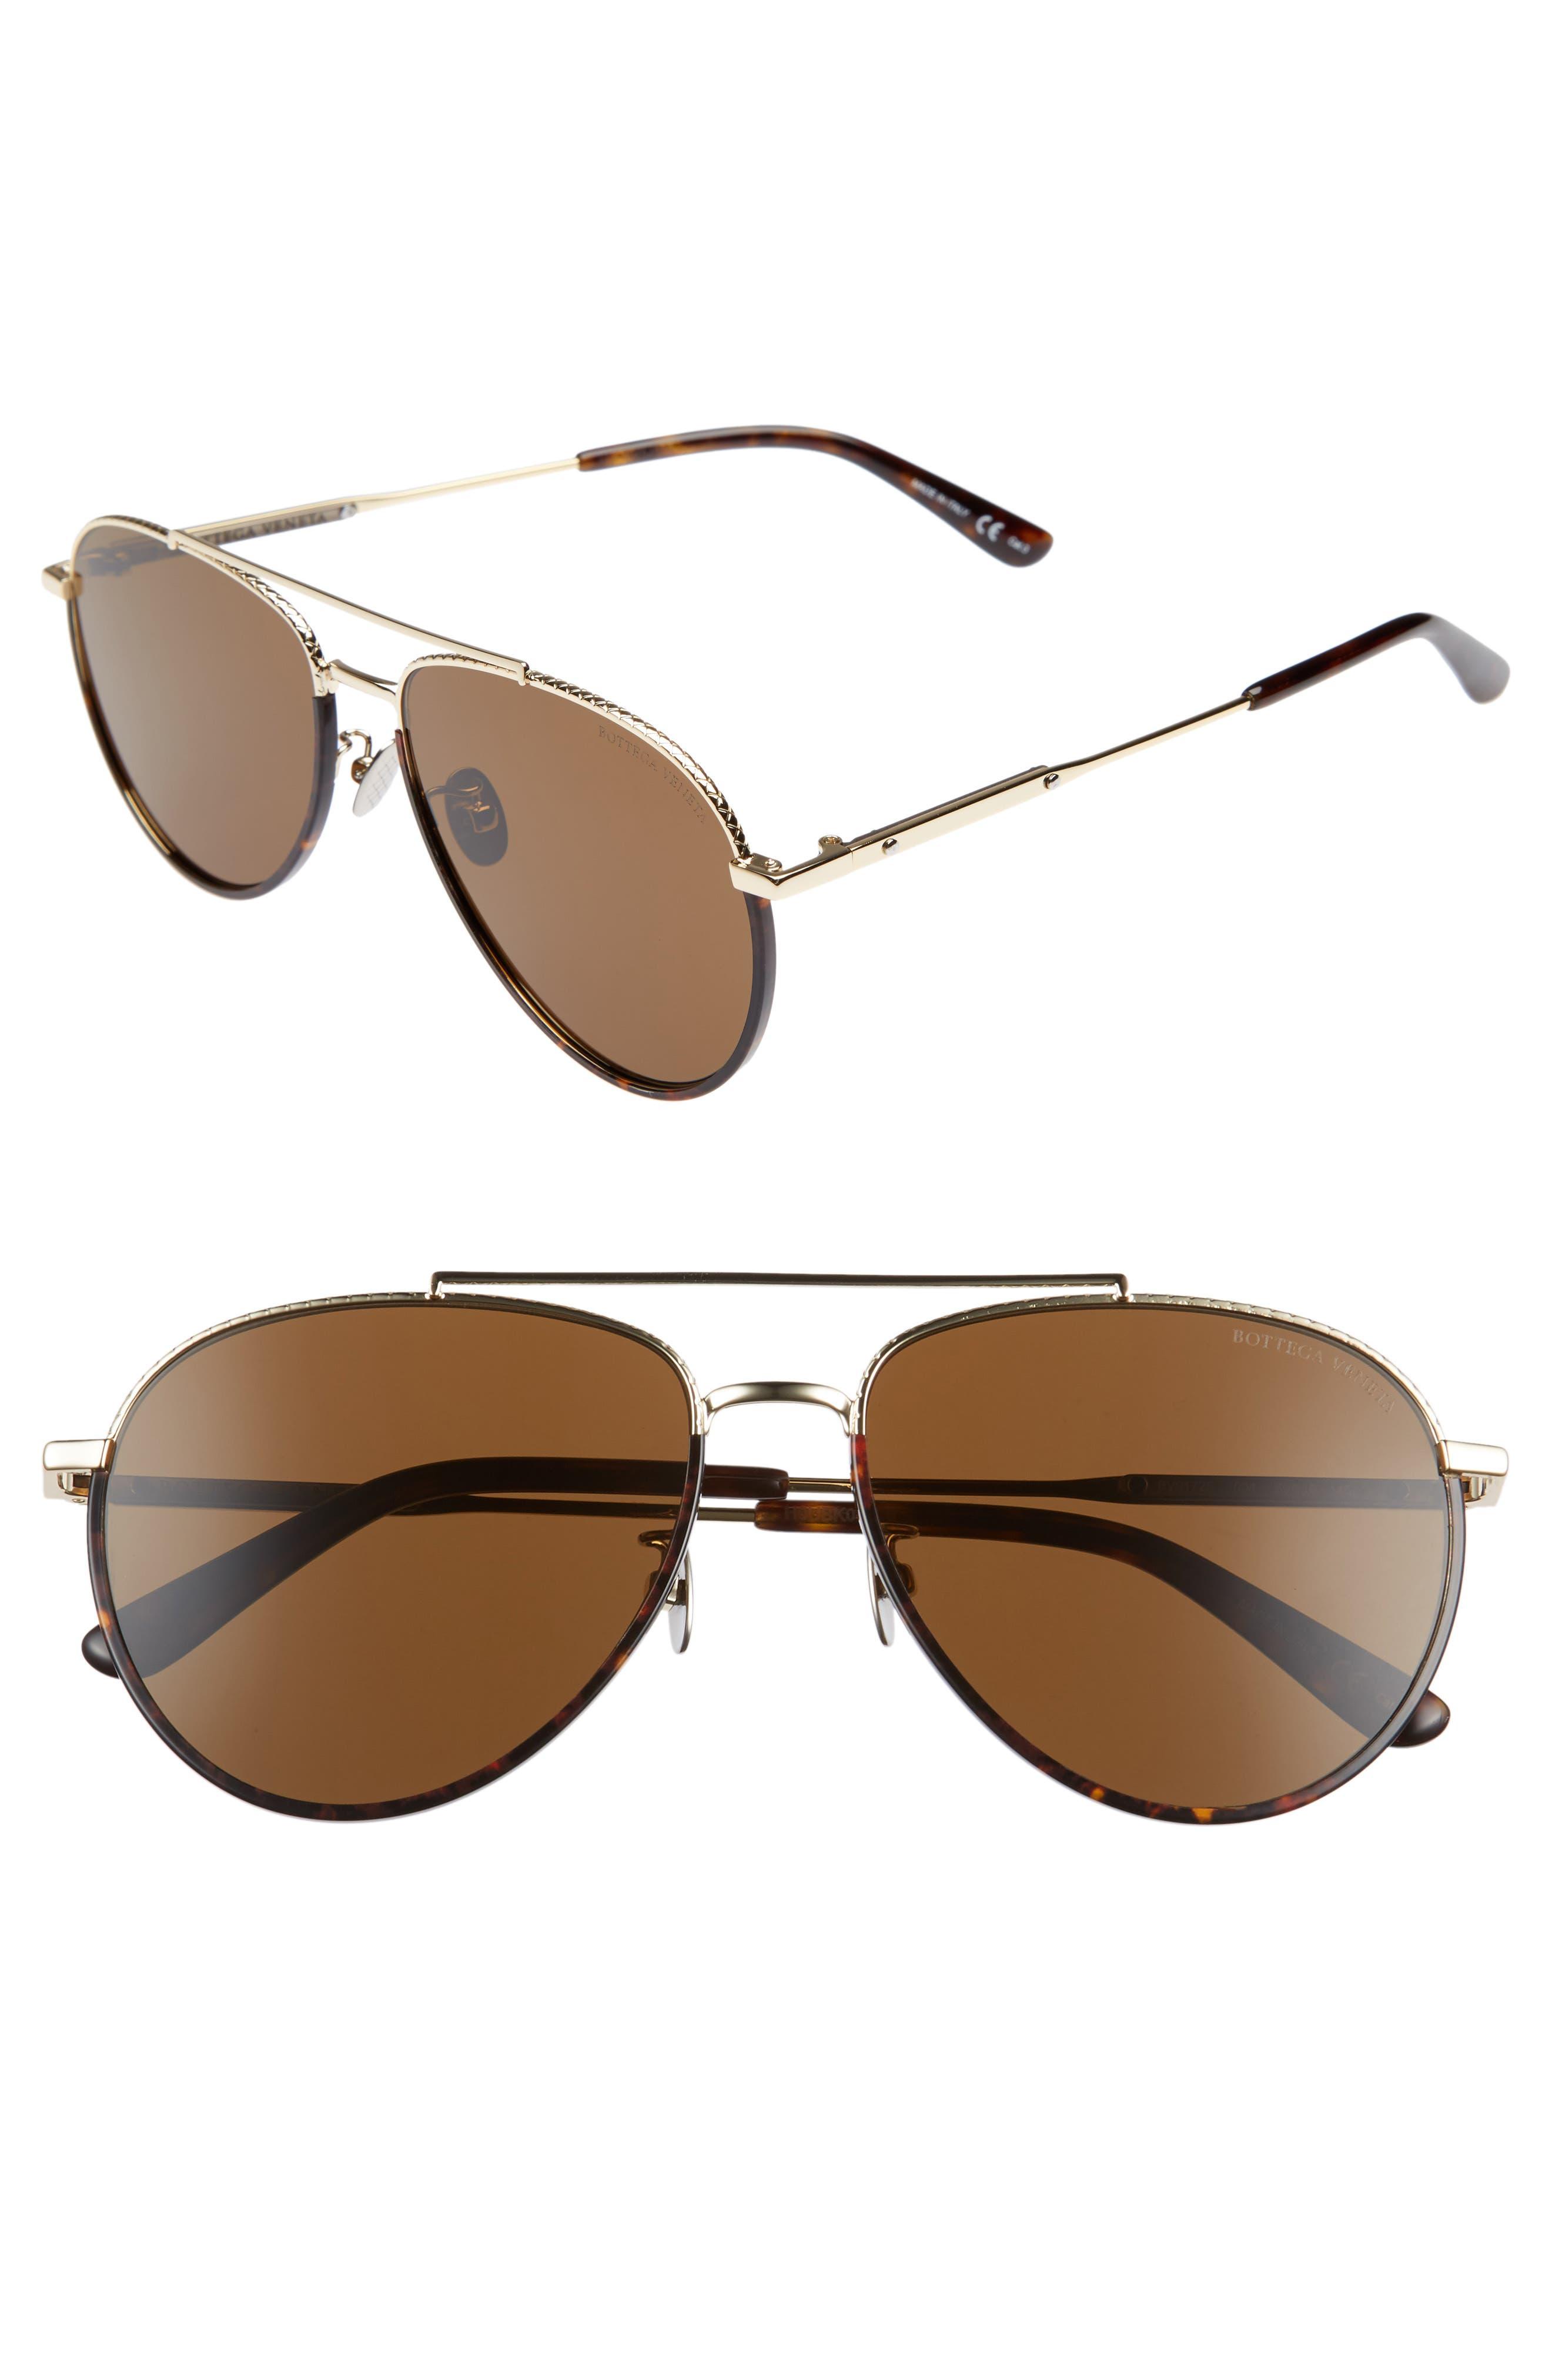 59mm Aviator Sunglasses,                         Main,                         color, Gold/ Dark Havana